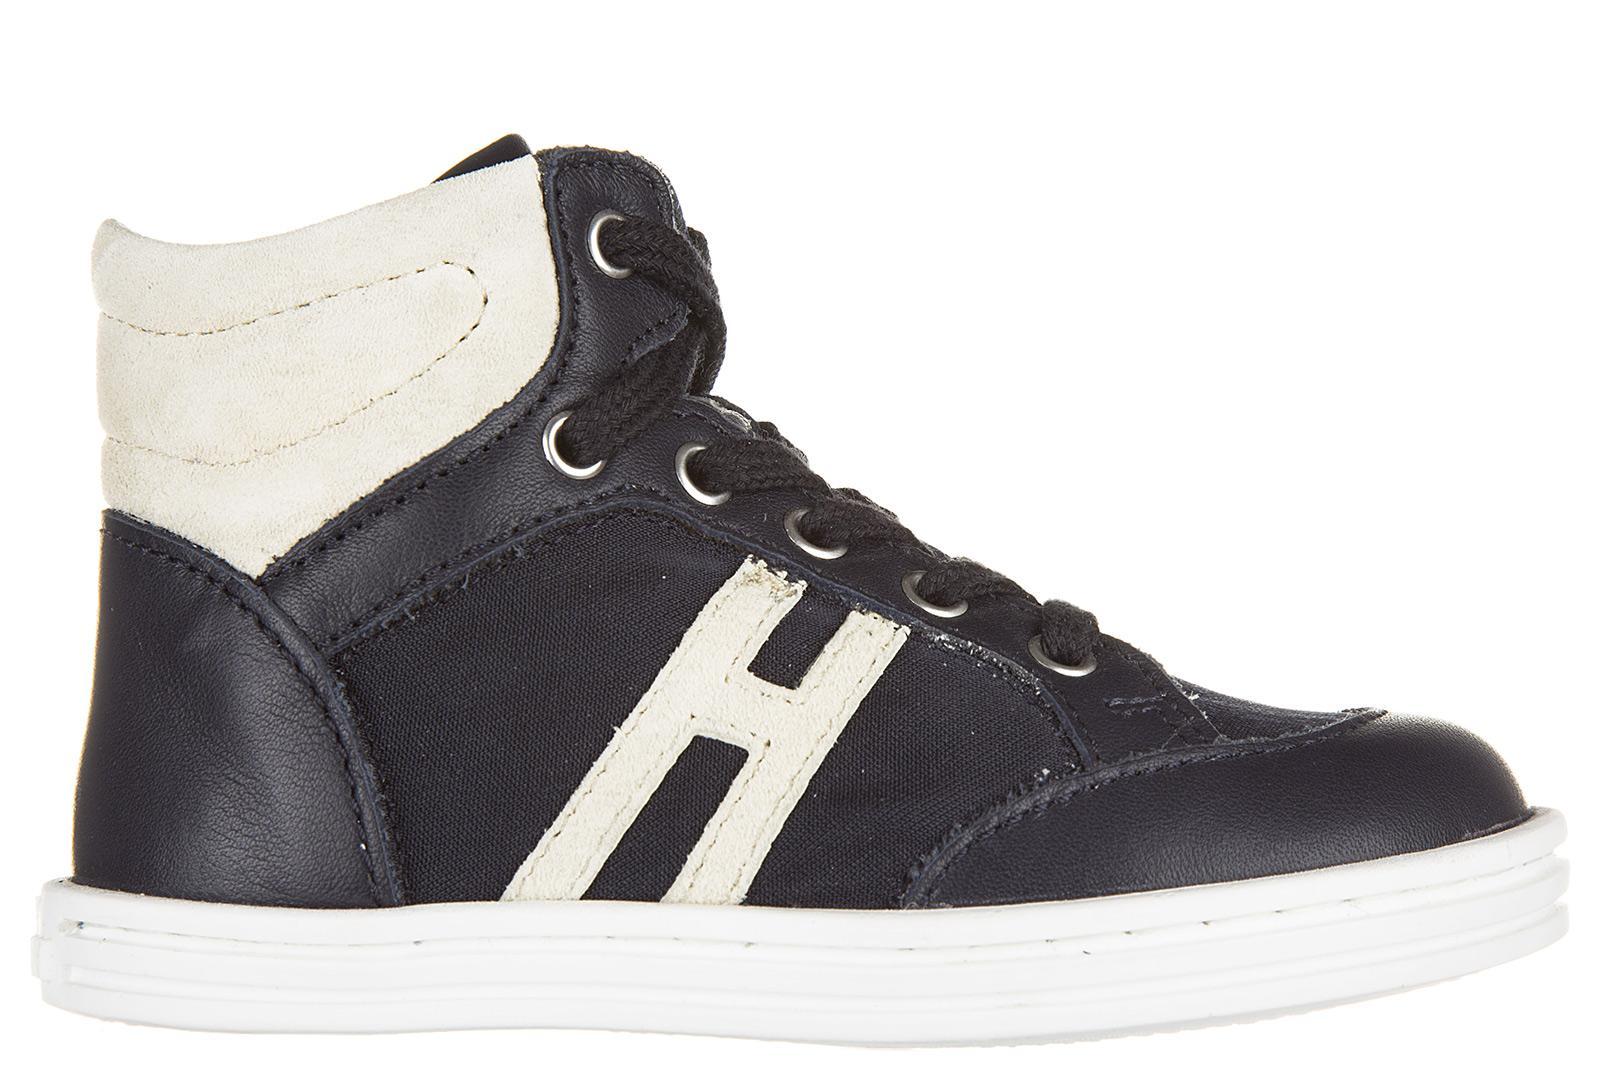 Hogan Rebel Boys Shoes Child Sneakers Alte Pelle Rebel R141 In ...